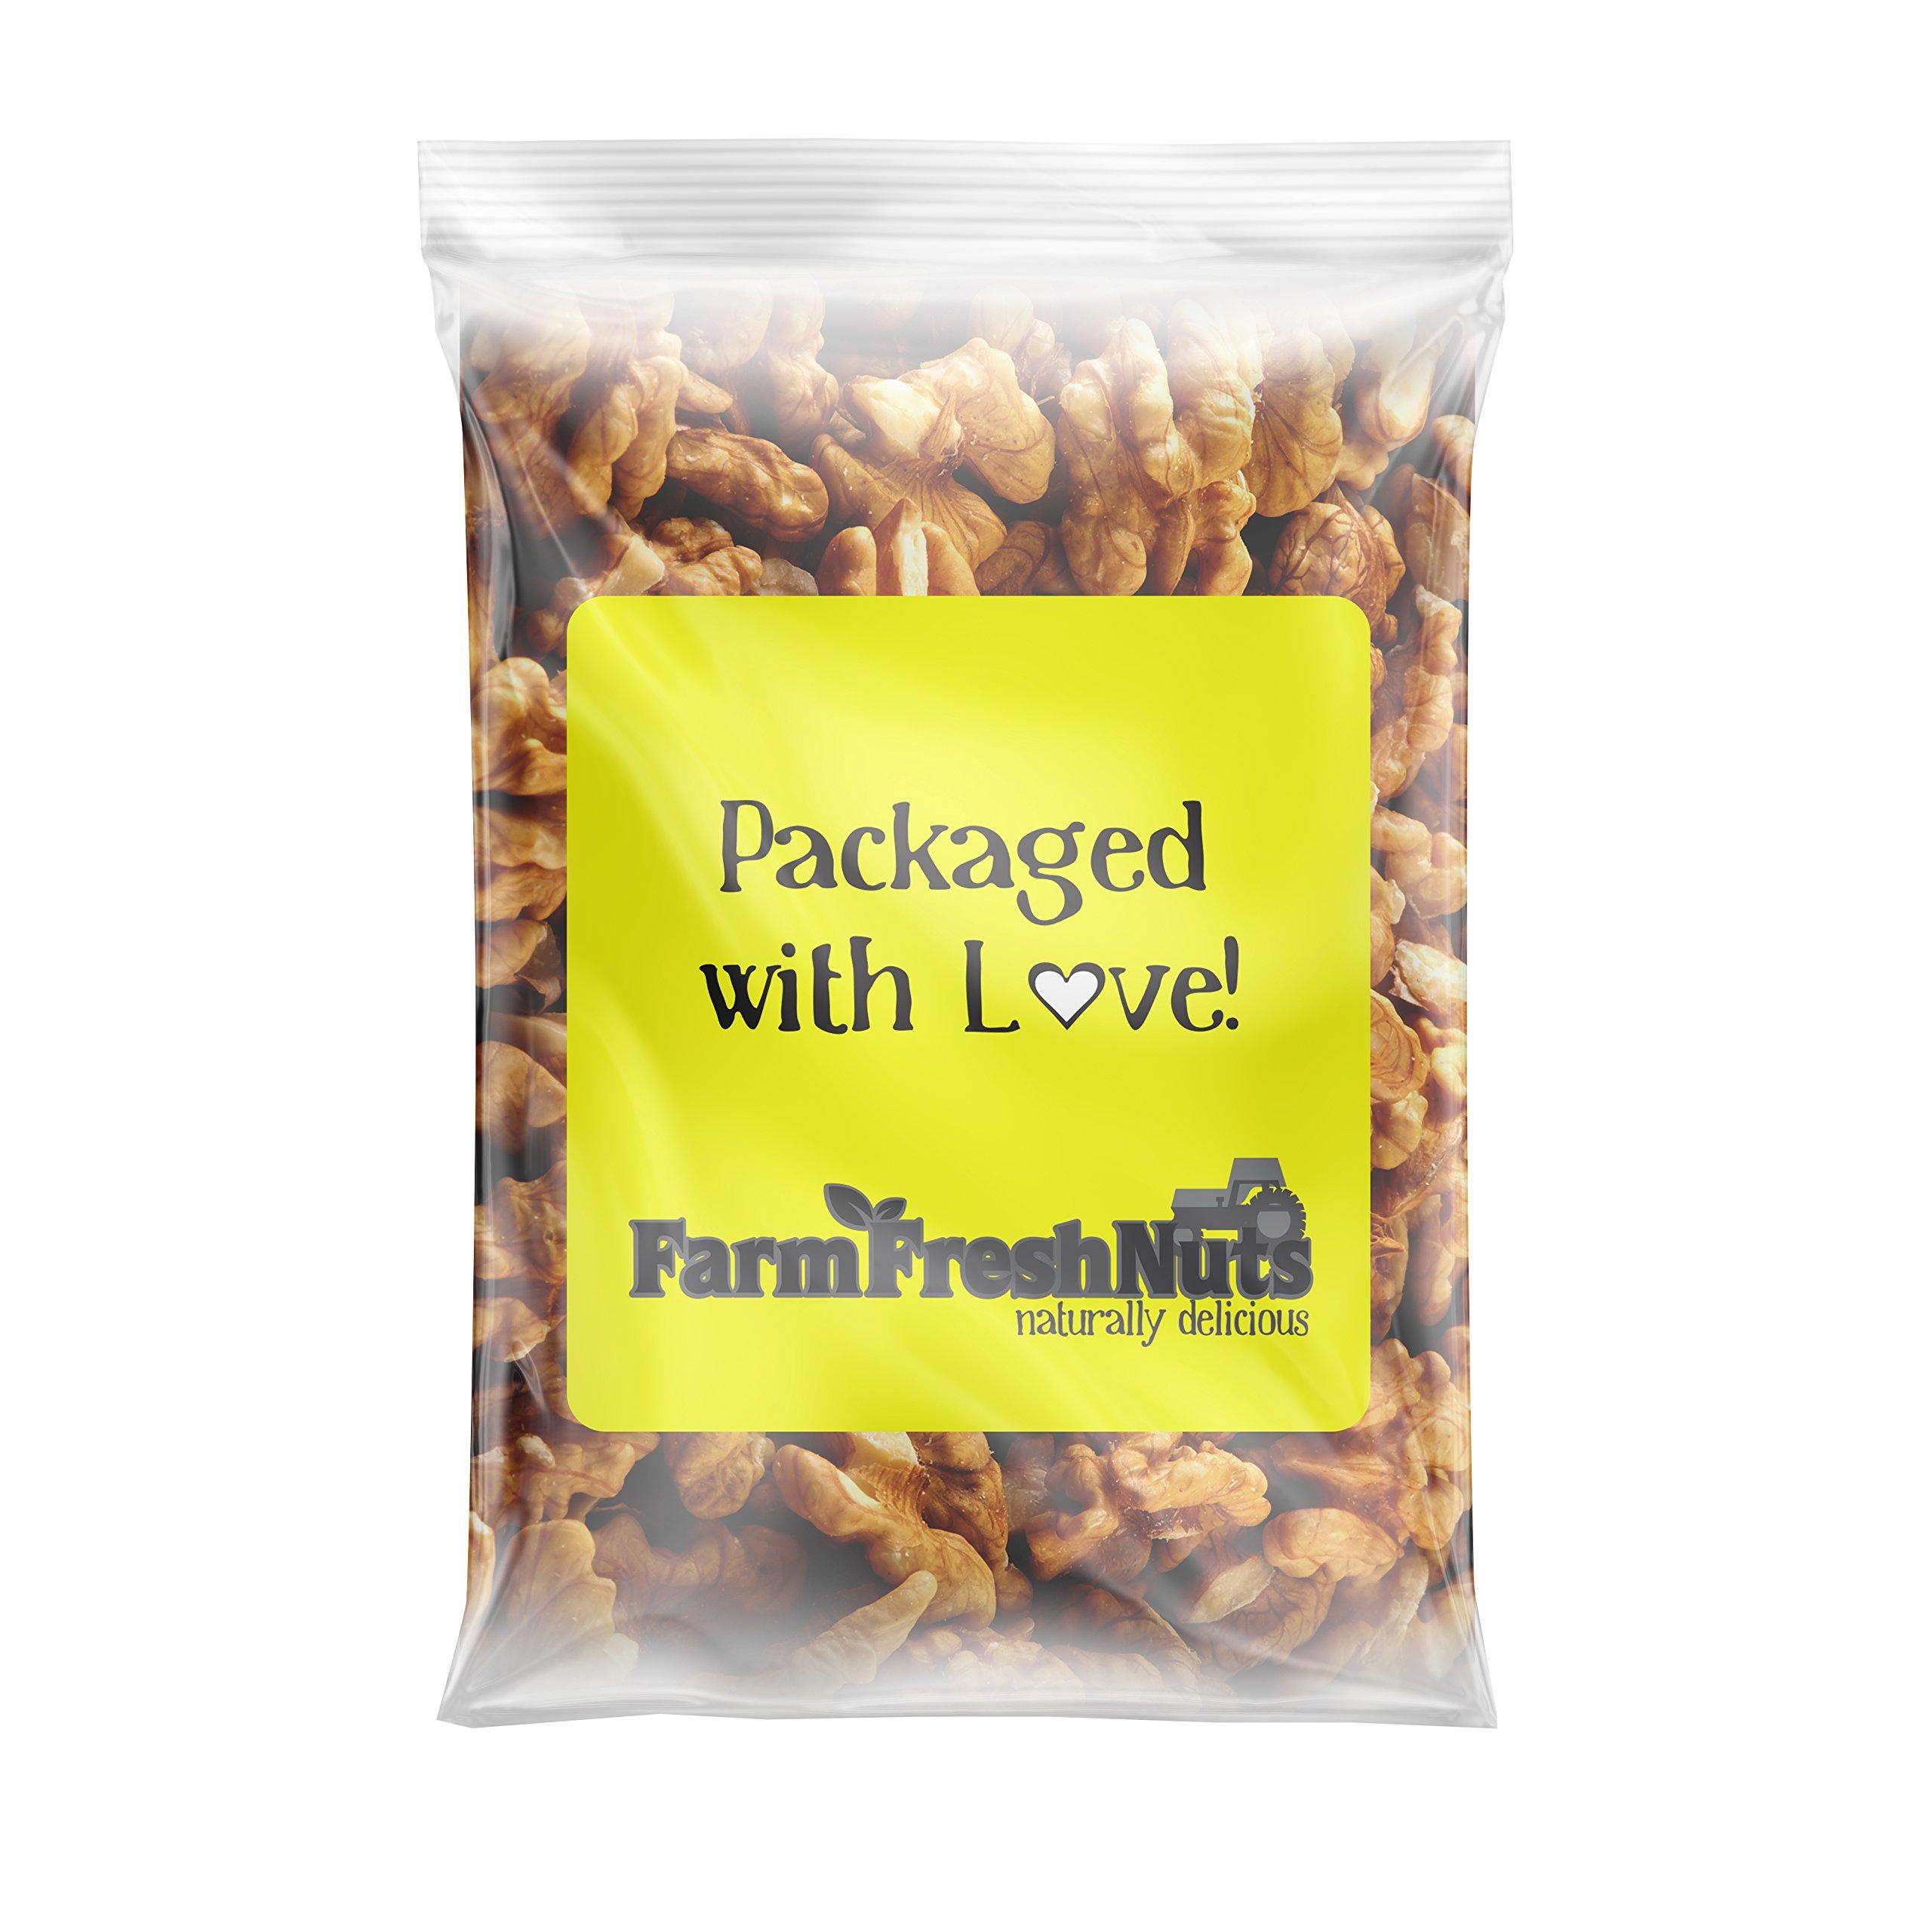 CALIFORNIA WALNUTS Halves & Pieces - Great Source of Omega 3 - Super Crunchy - (5 LB) - Farm Fresh Nuts Brand.